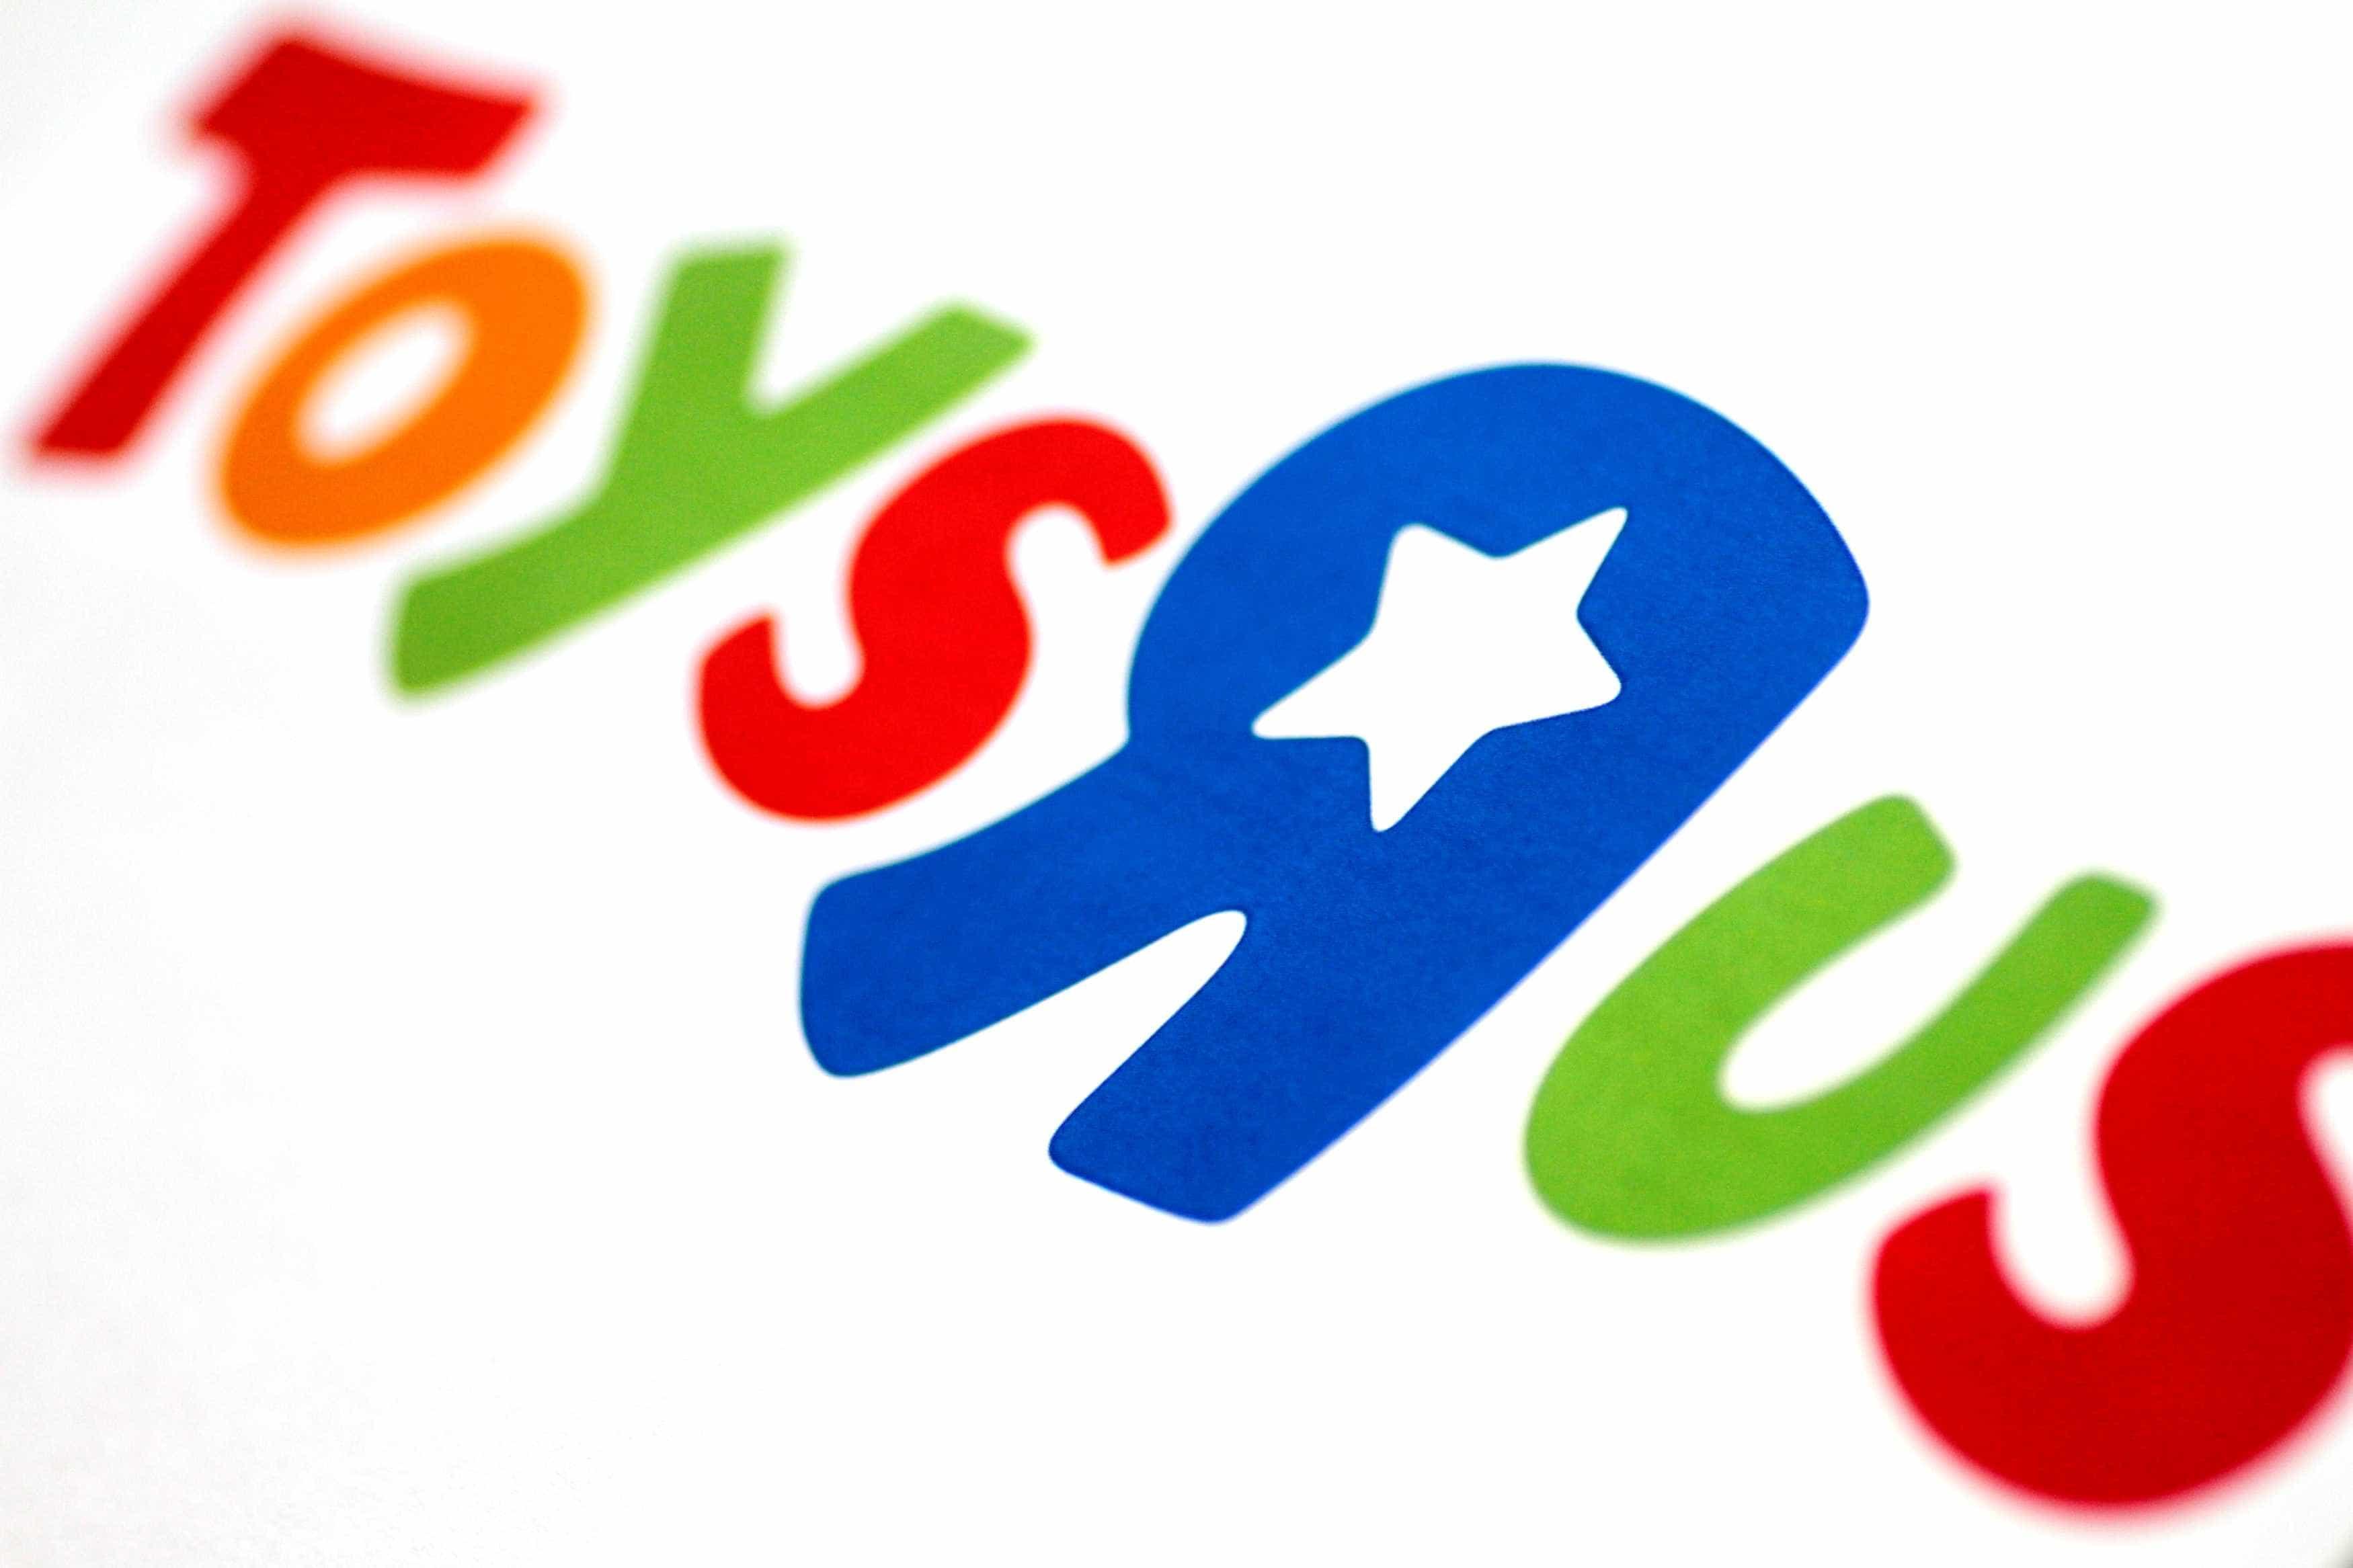 Portuguesa dona da Toys 'R' Us compra holandesa Intertoys